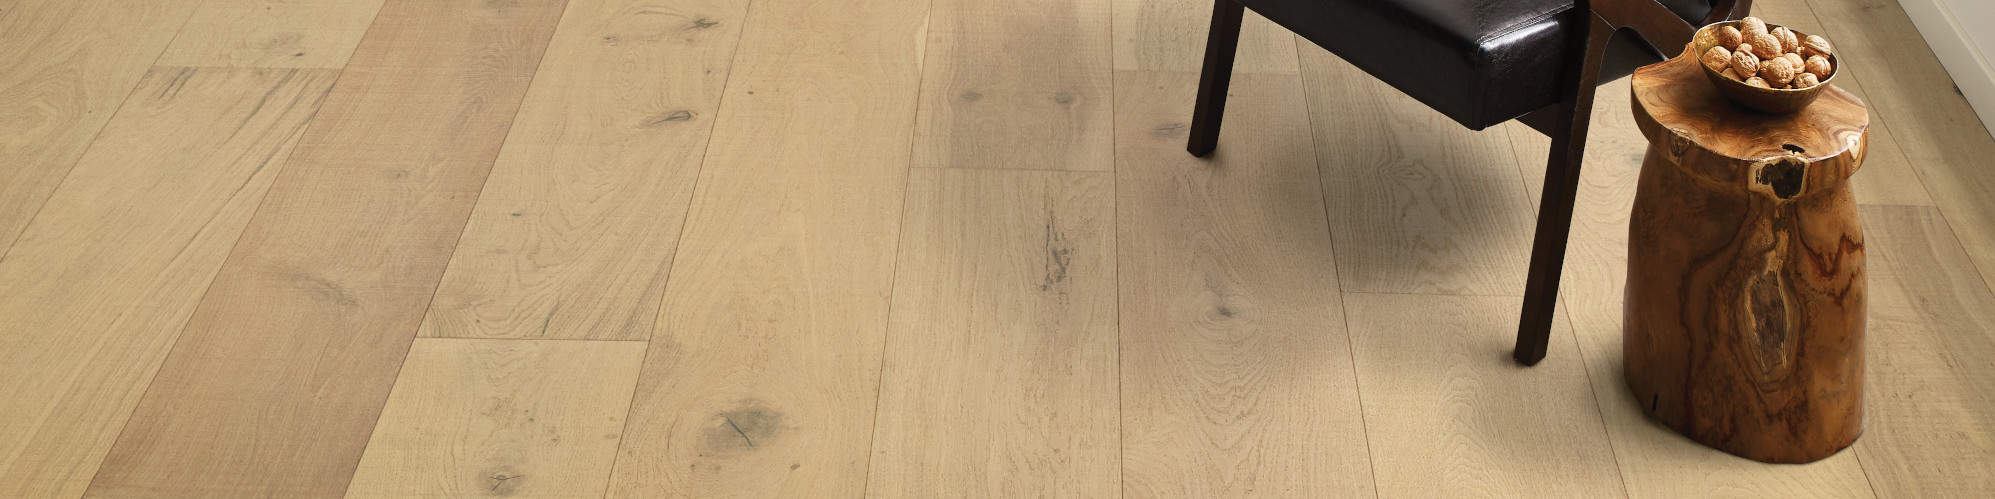 Hardwood-Anderson-Tuftex-Natural-Timbers-Bandsaw-aa826-15029-Living-Room-2020